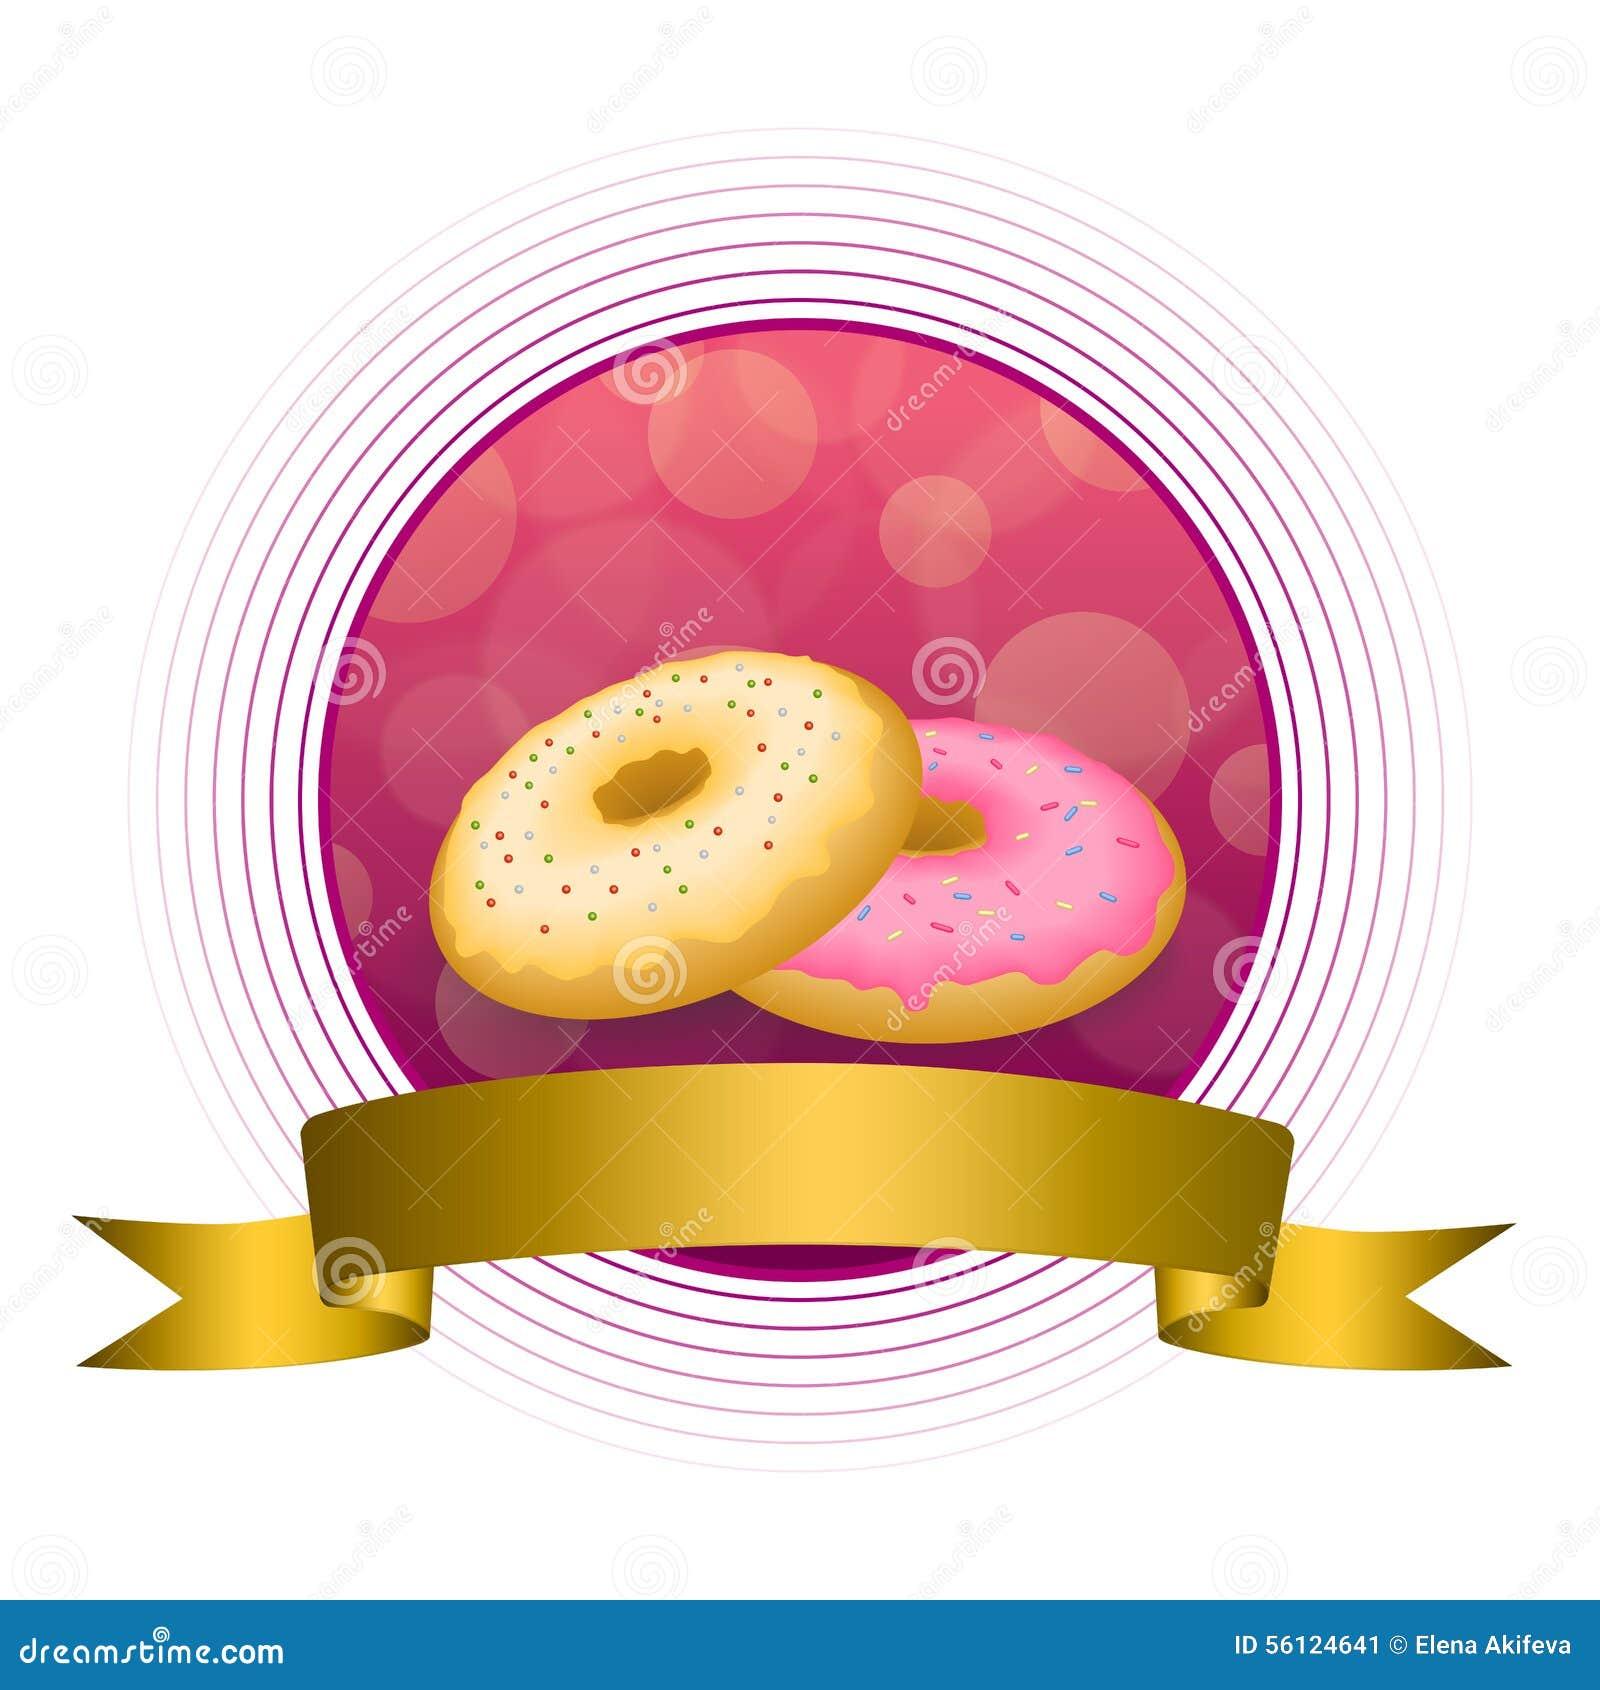 Abstraktes Hintergrundlebensmittel-Rosagelb backte Donut glasig-glänzende Ringgoldkreisrahmen-Bandillustration